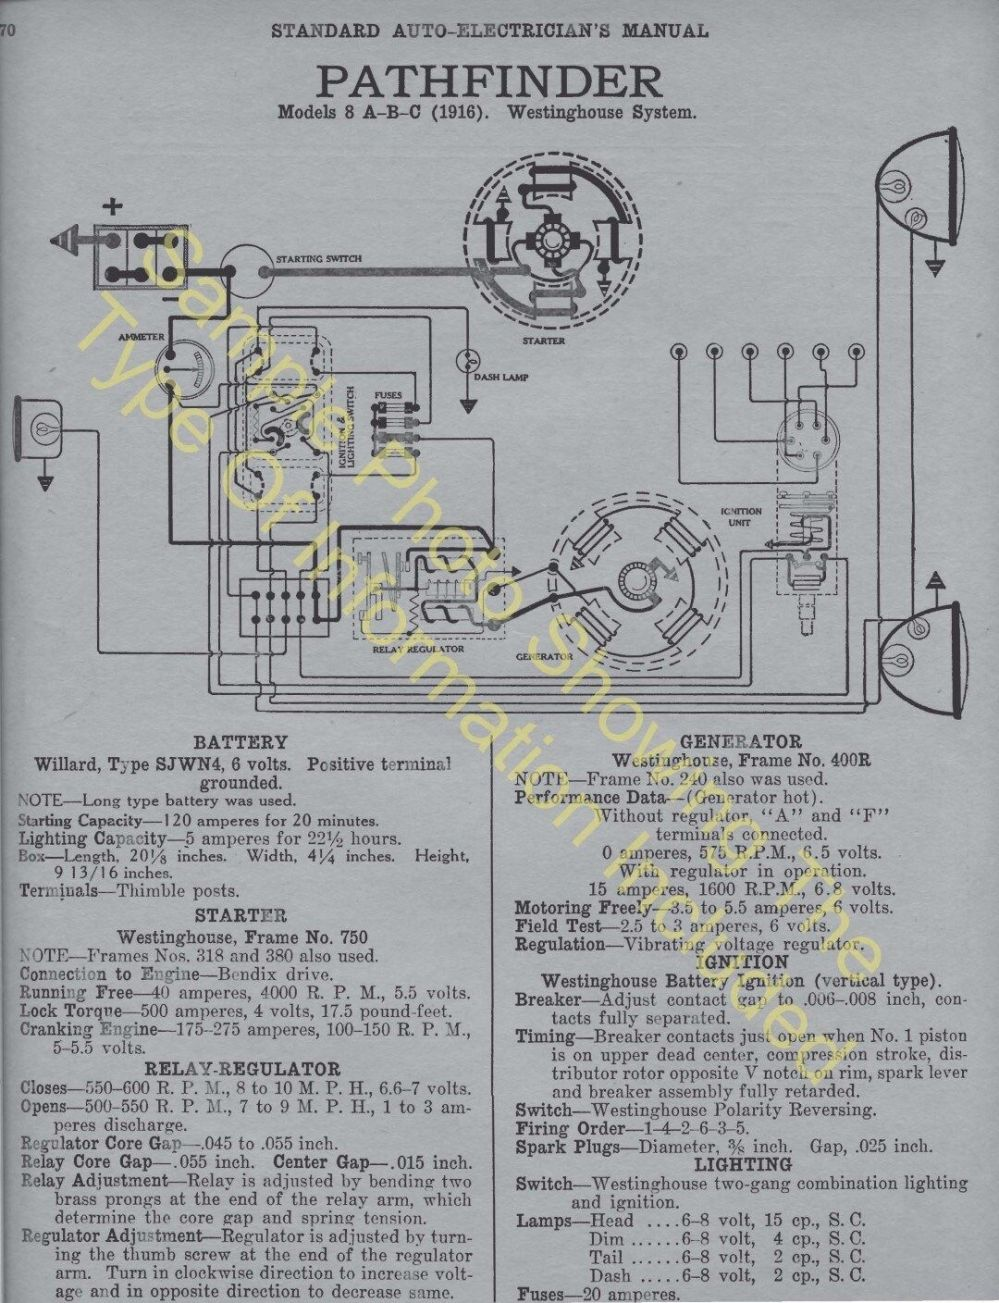 medium resolution of 1920 1921 auburn models 6 39 6 51 car wiring diagram electric system specs 506